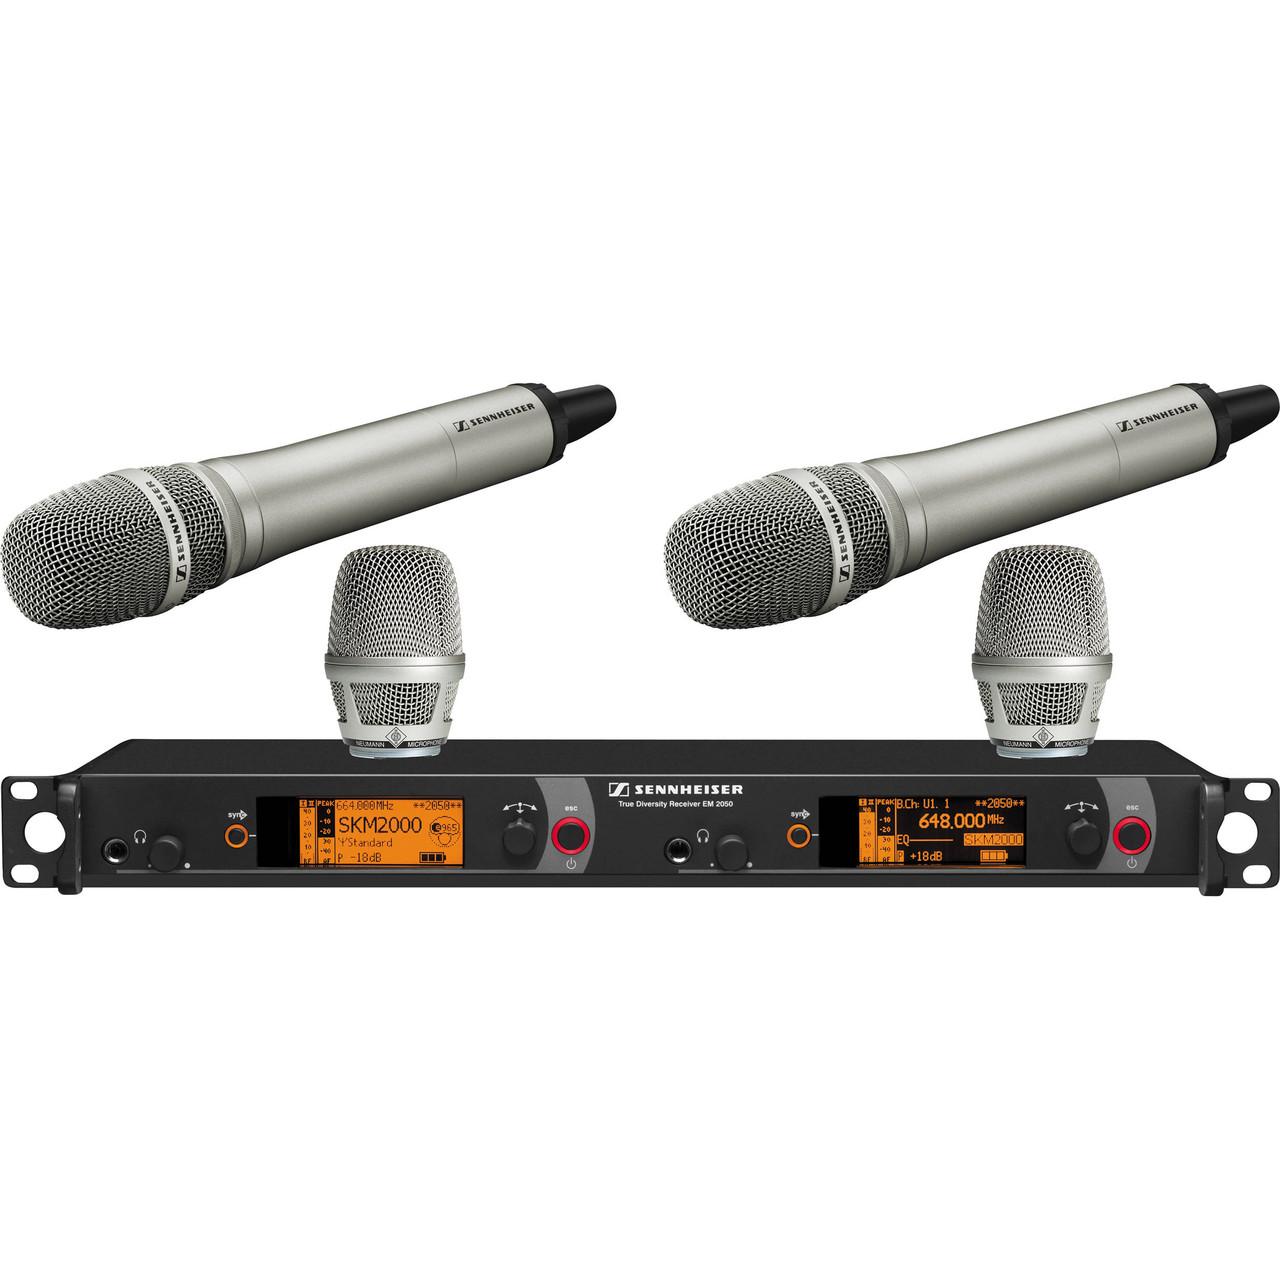 Беспроводная система Sennheiser 2000 Series Dual KK 204 Bw / 626 - 698MHz (2000H2-204NI-B)